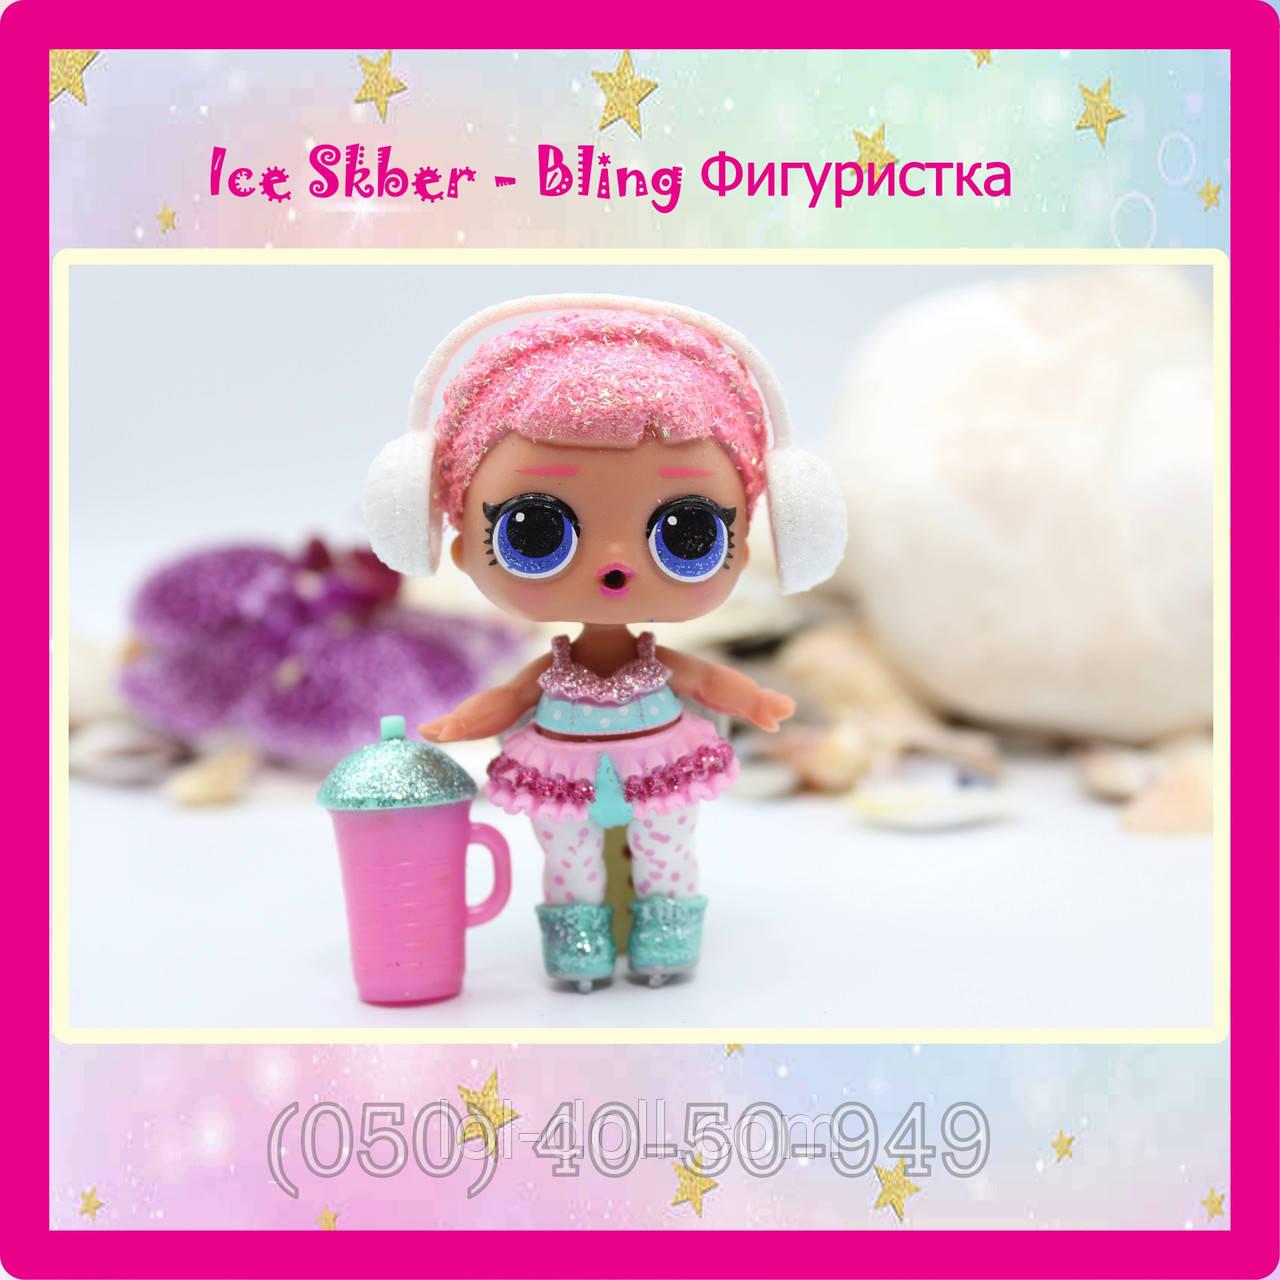 Кукла LOL Surprise Ice Skber - Bling Фигуристка Лол Сюрприз Без Шара Оригинал